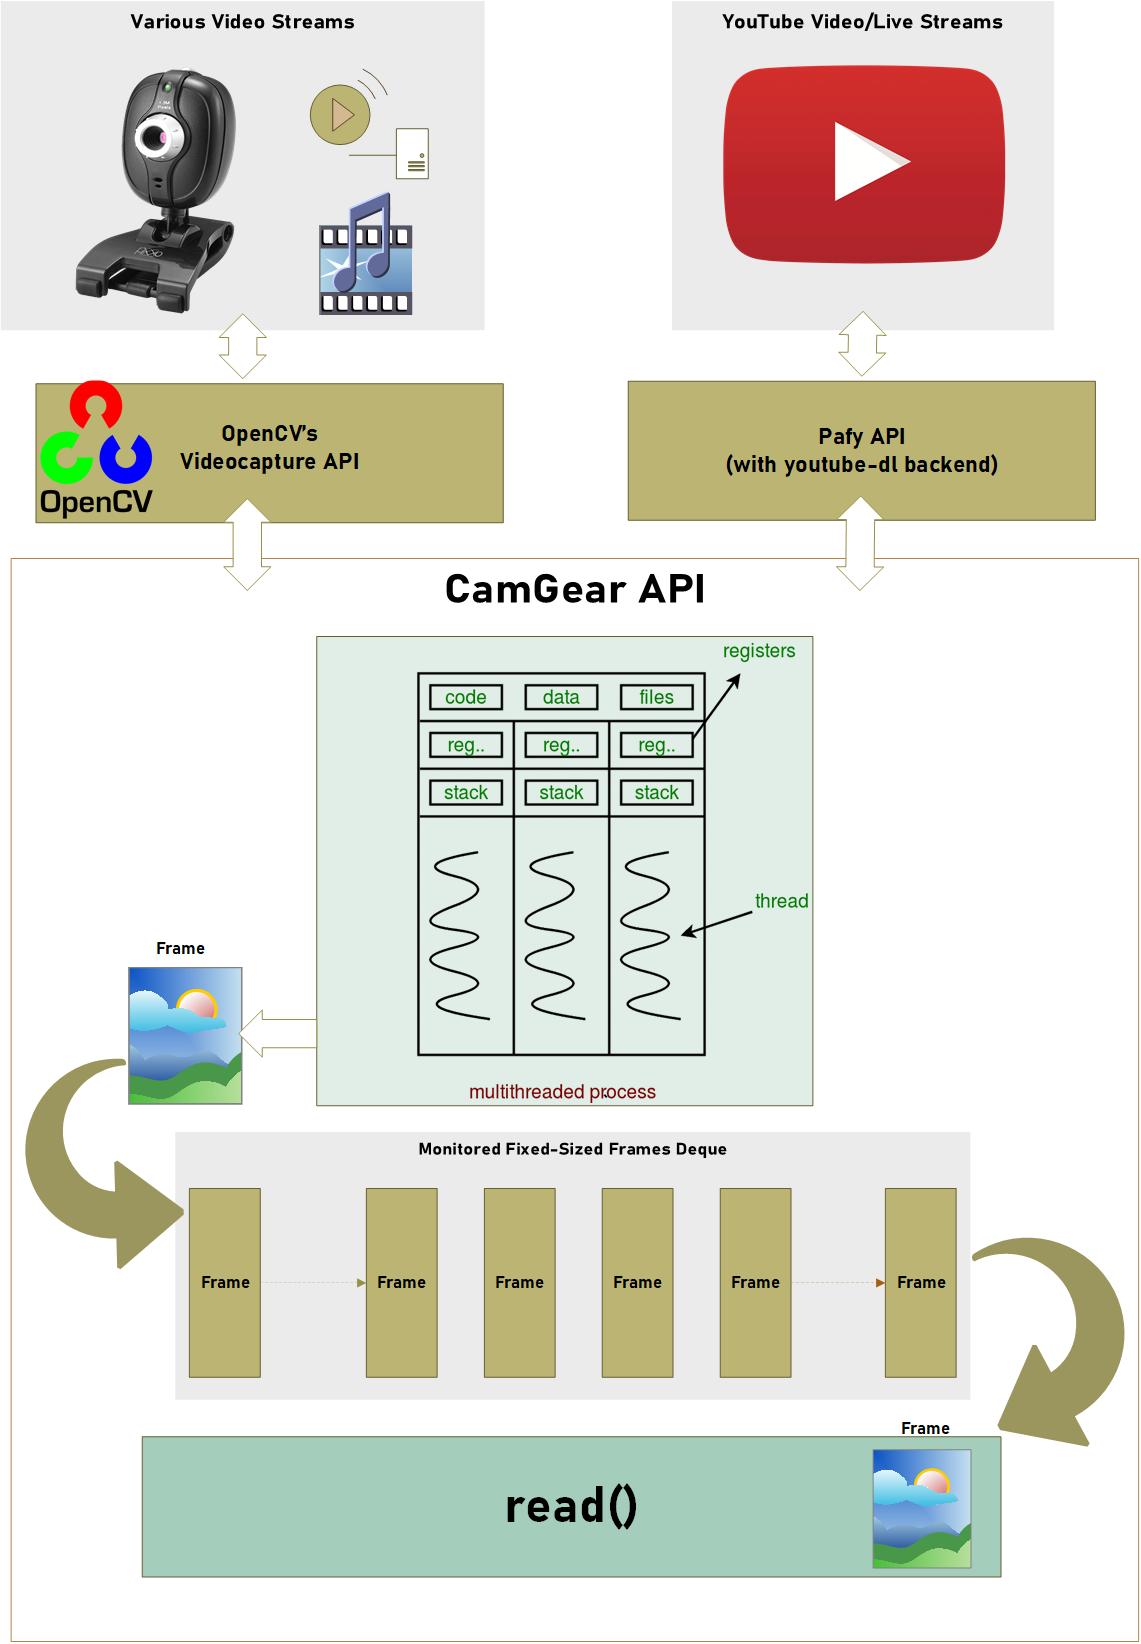 CamGear Functional Block Diagram